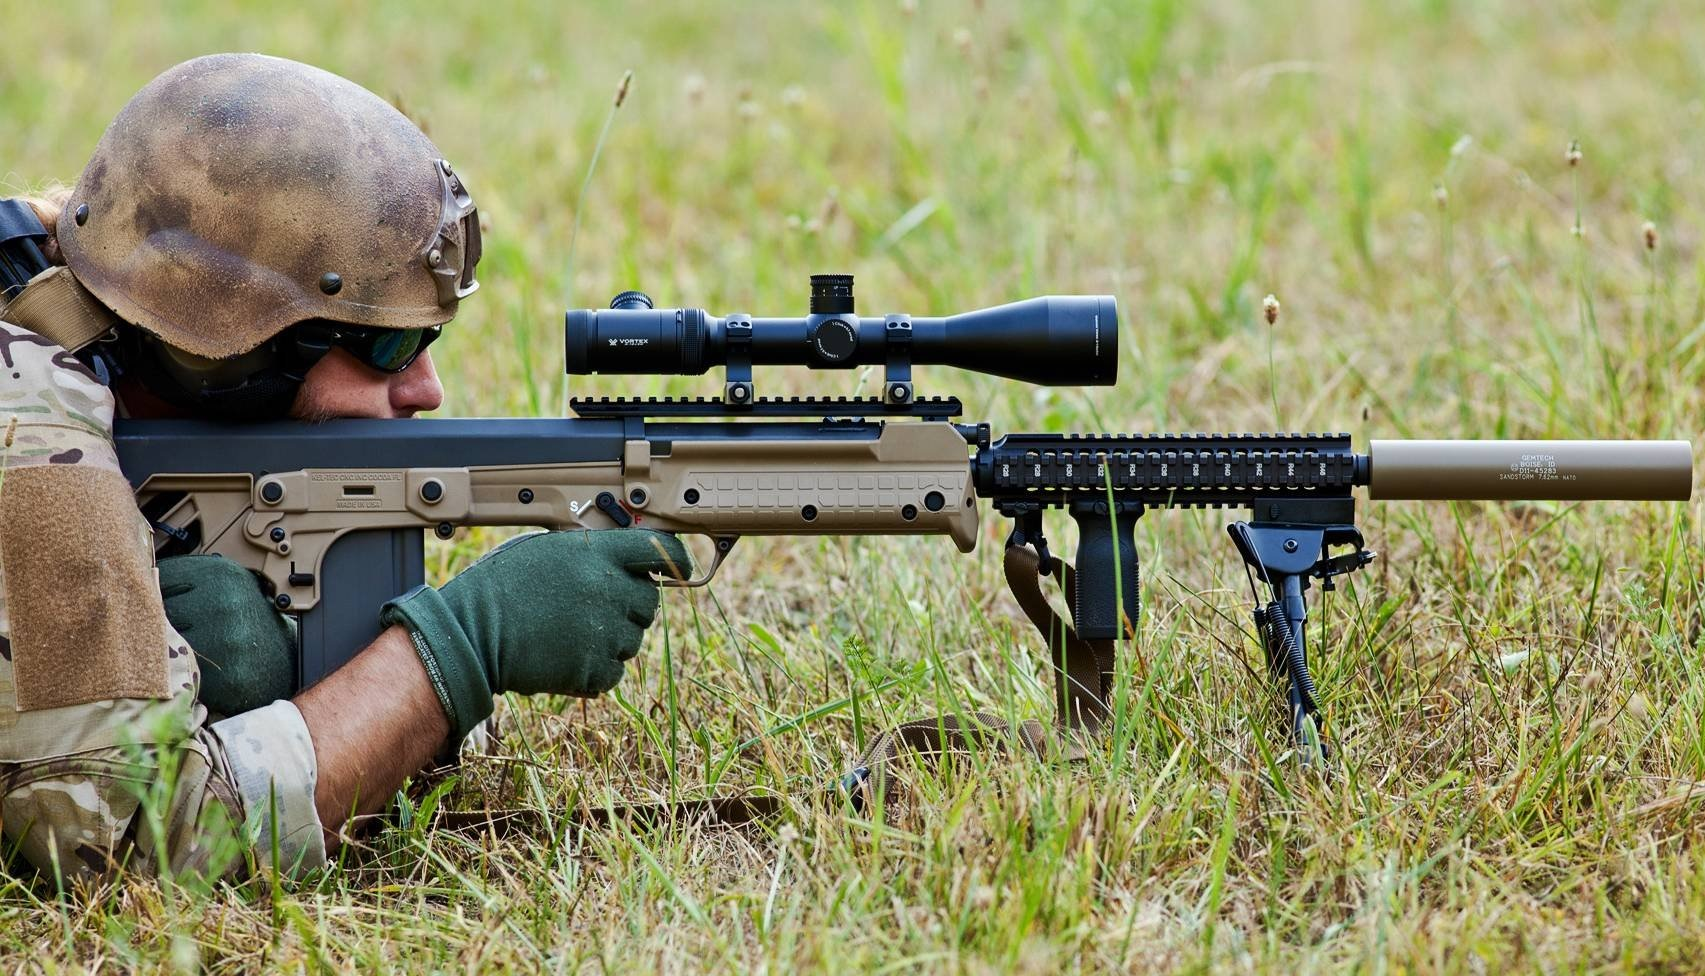 The Kel-Tec RFB: The Best Bullpup Semi-Automatic Rifle?